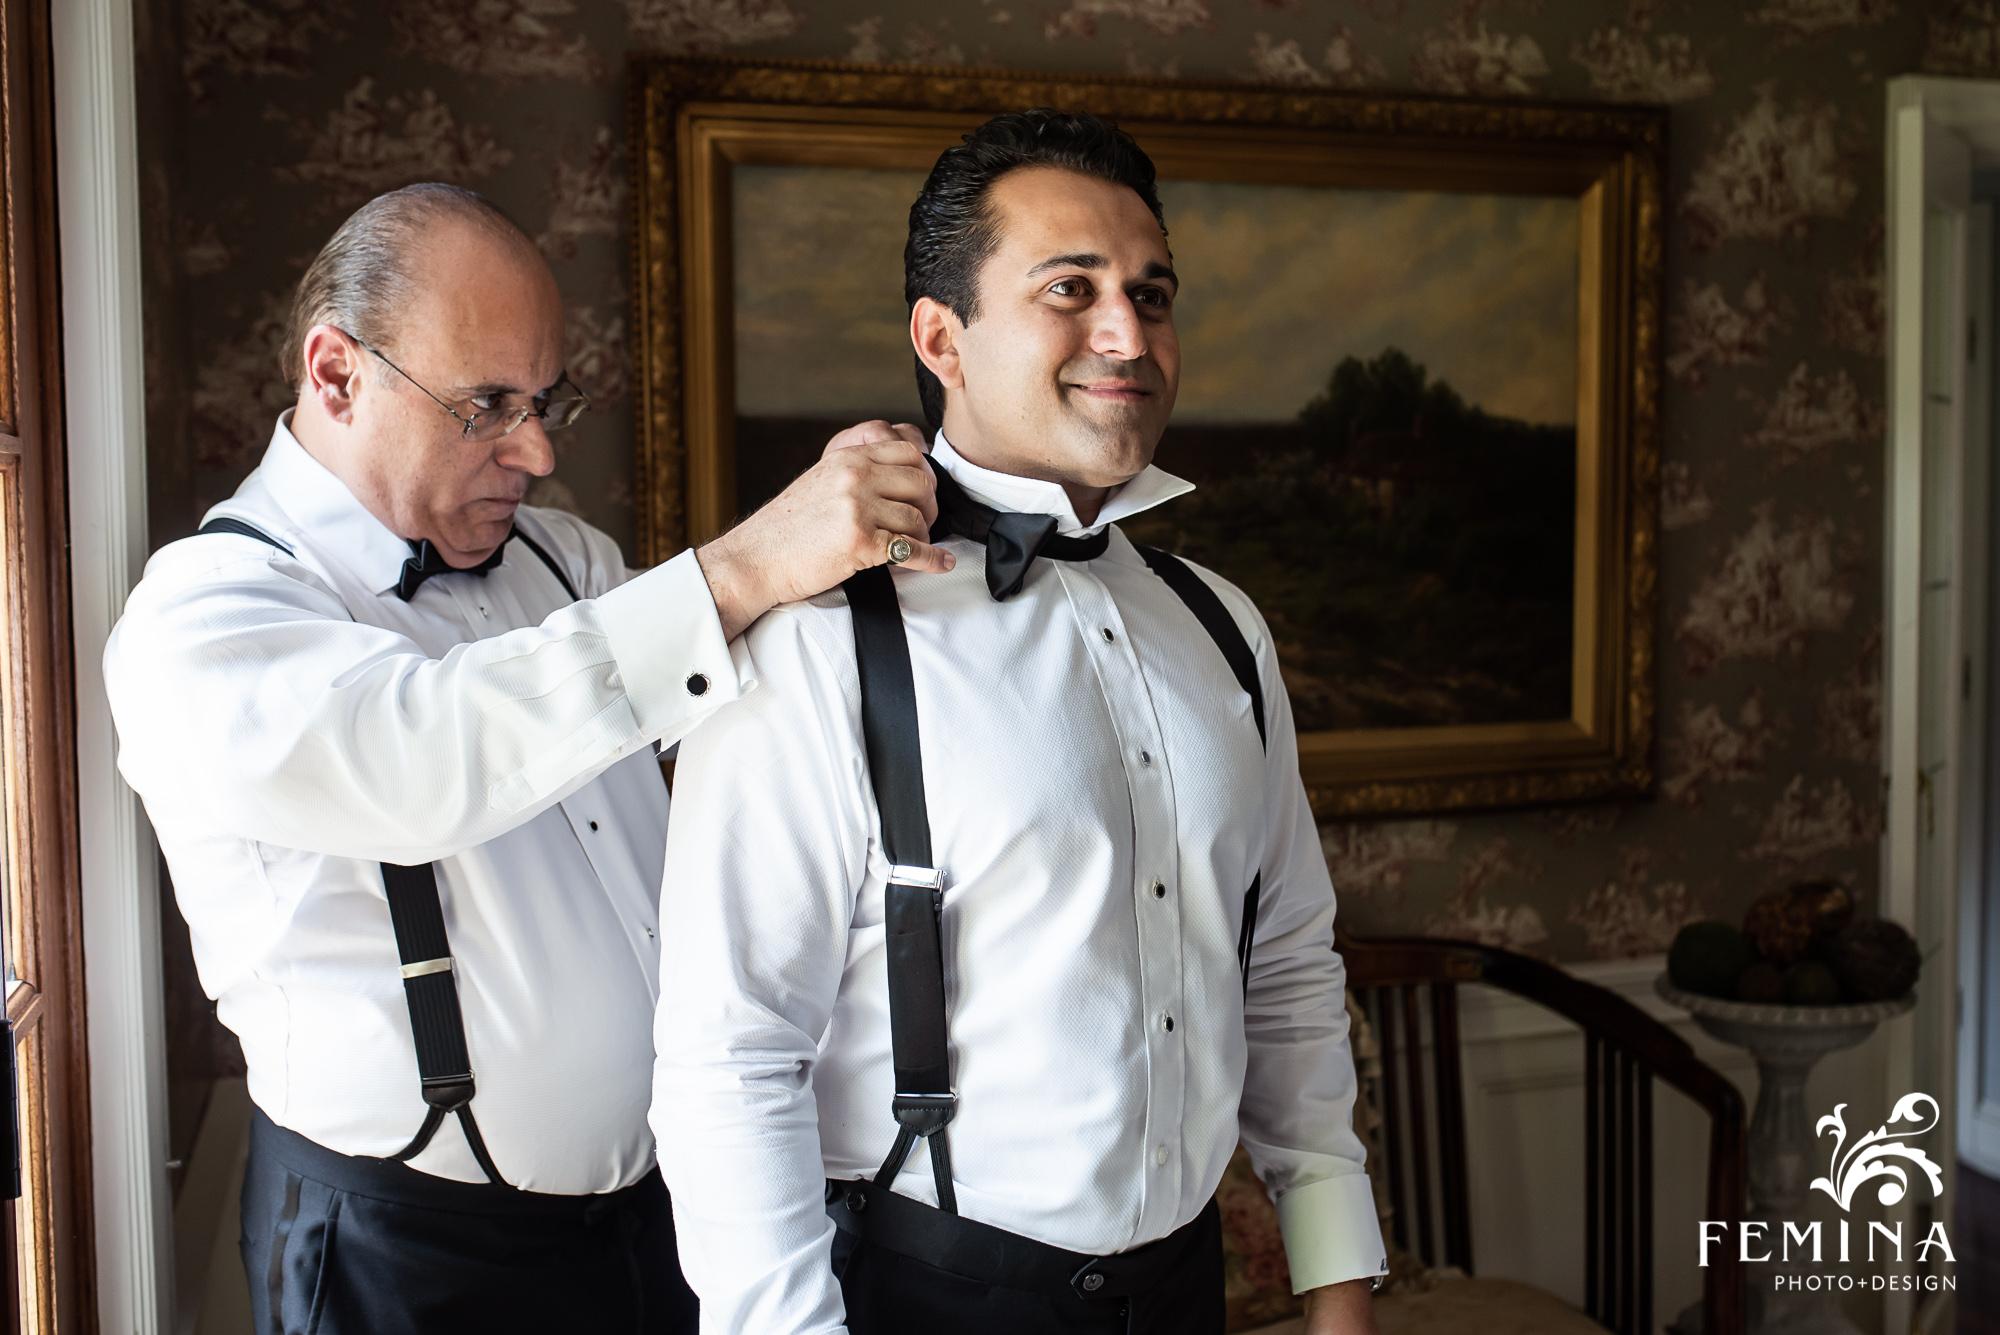 Groom Alex getting ready for his wedding day